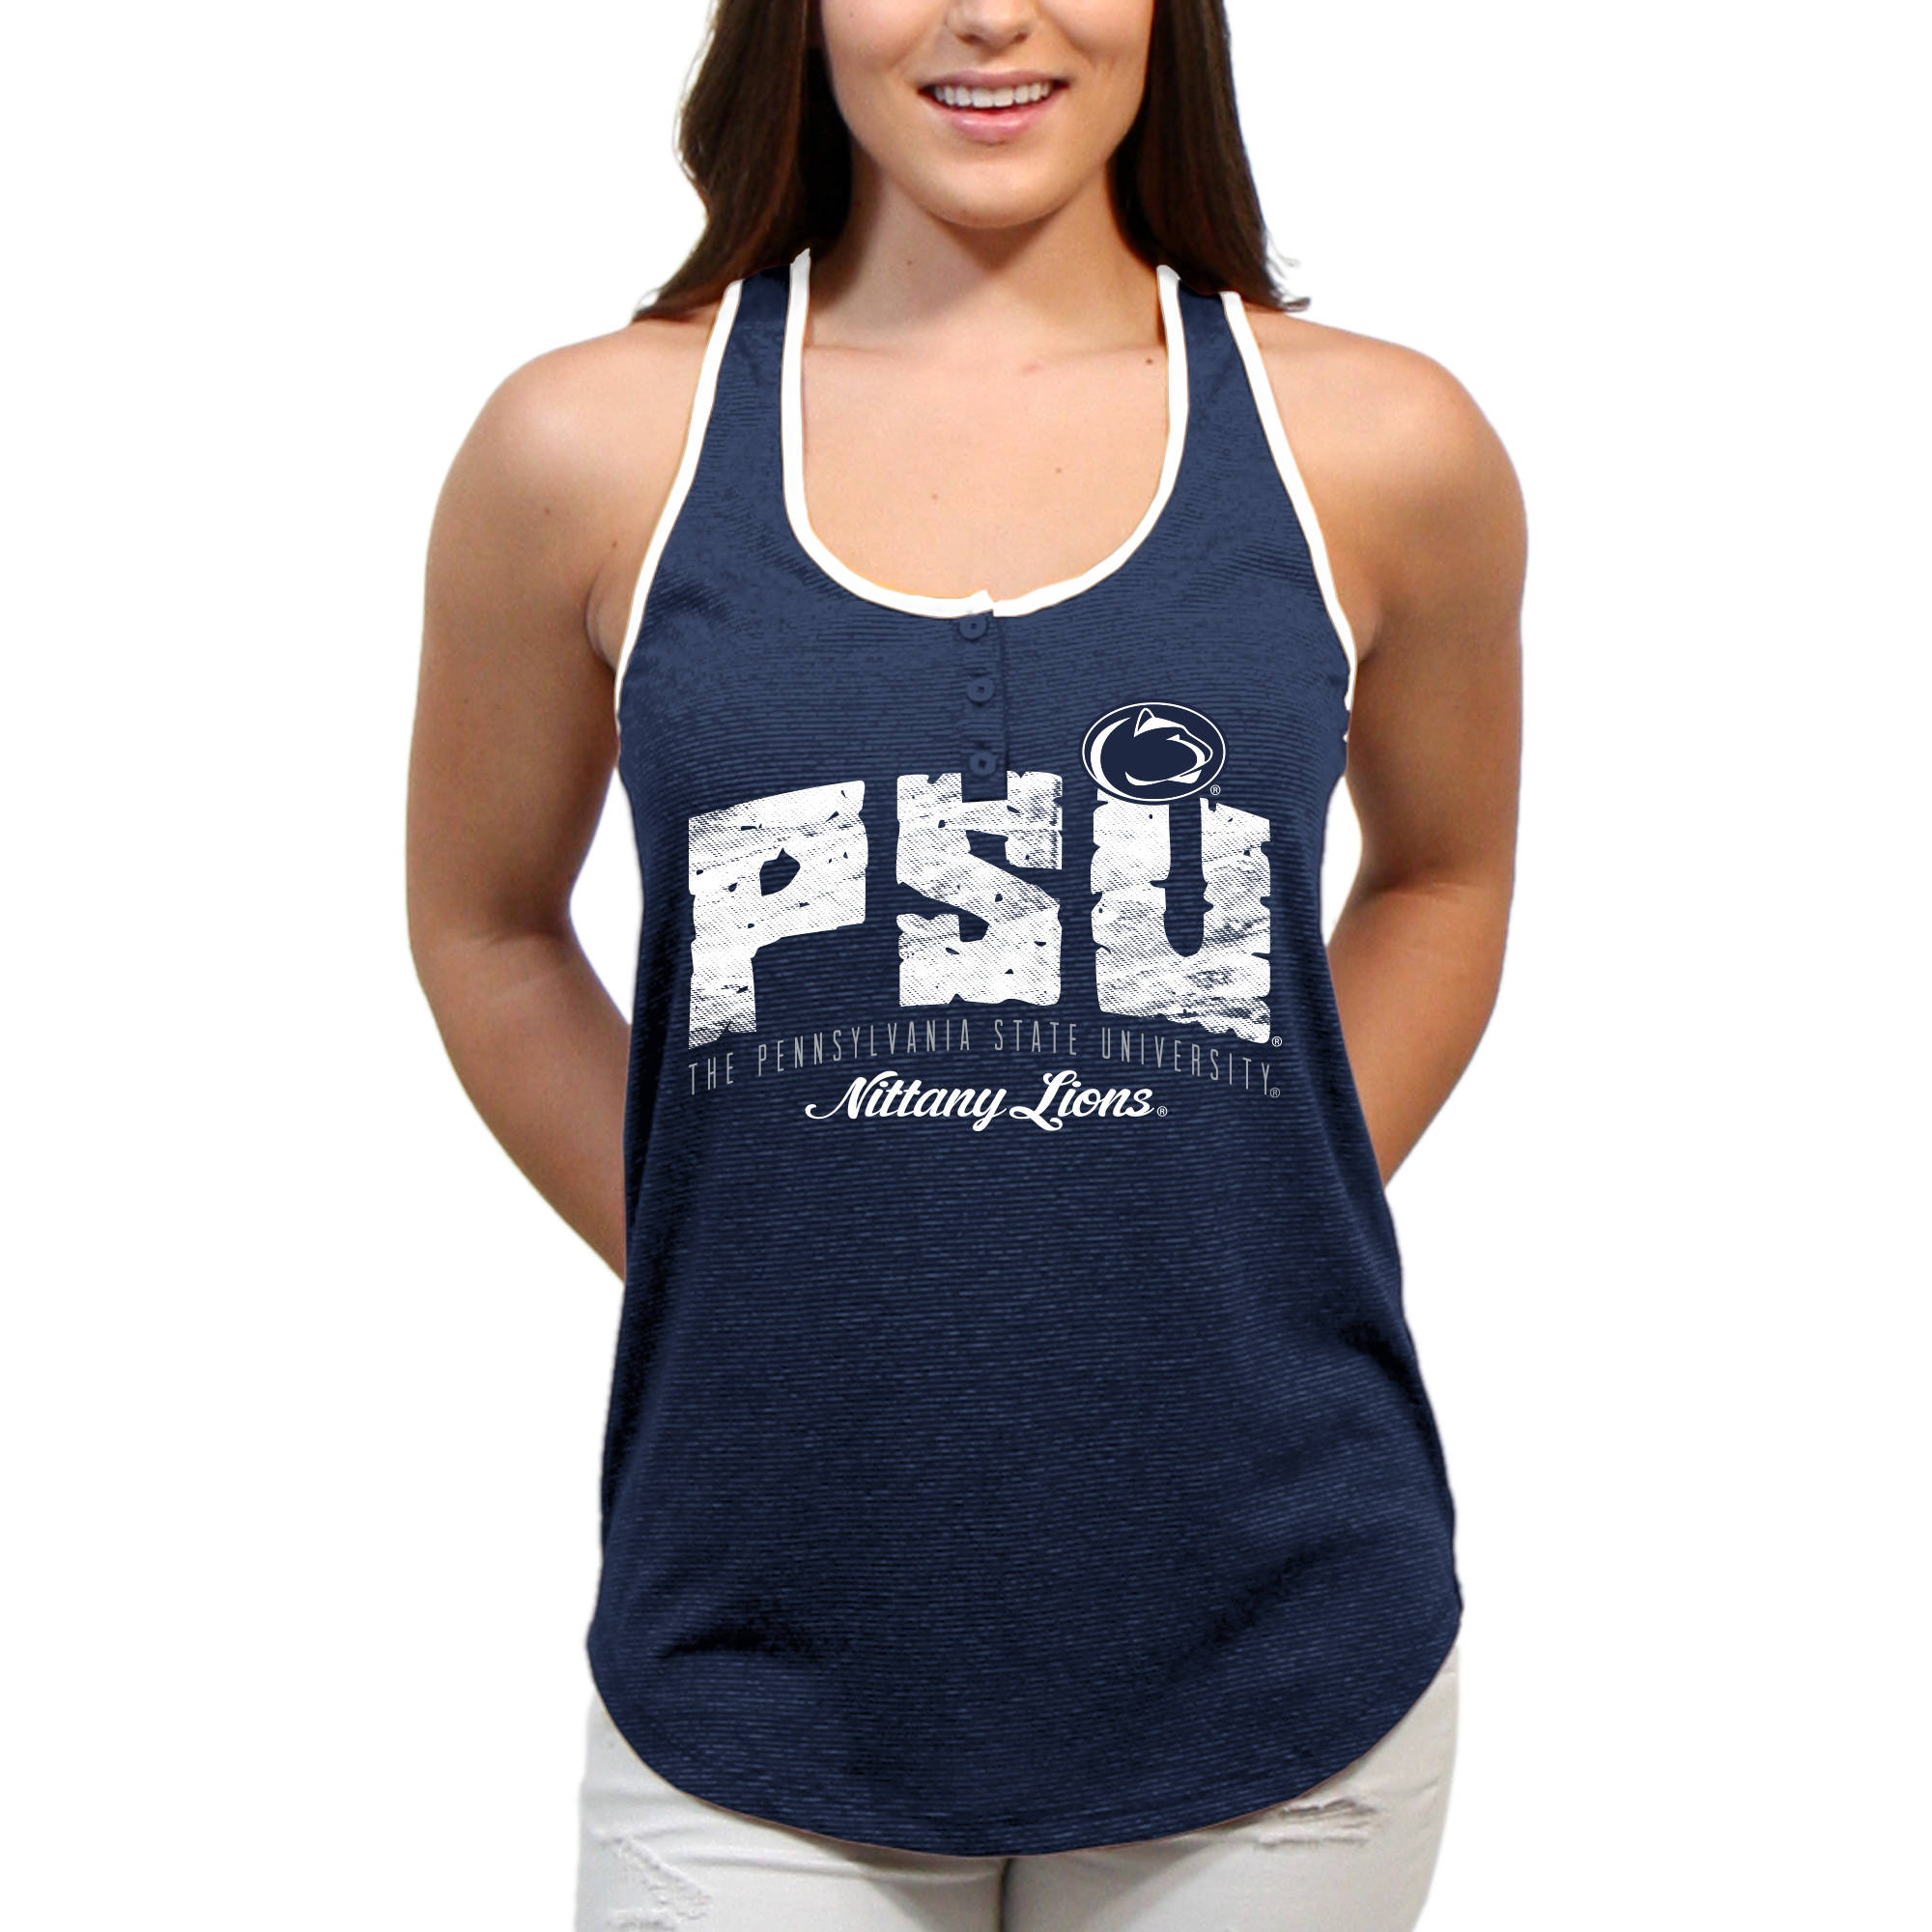 Penn State Nittany Lions Choppy Arch Women'S/Juniors Team Tank Top